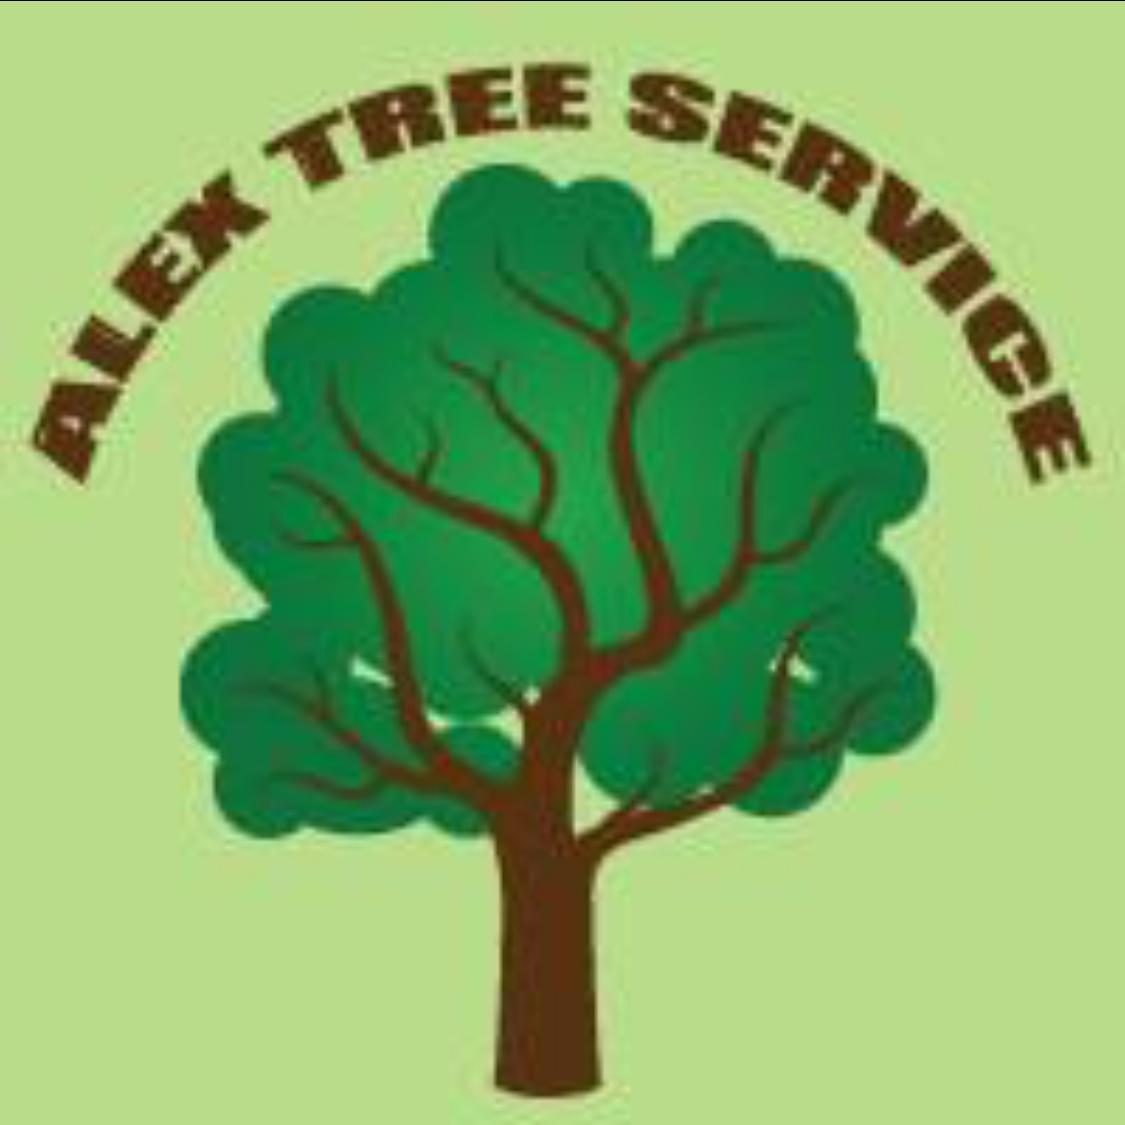 Alex Tree Service Pa